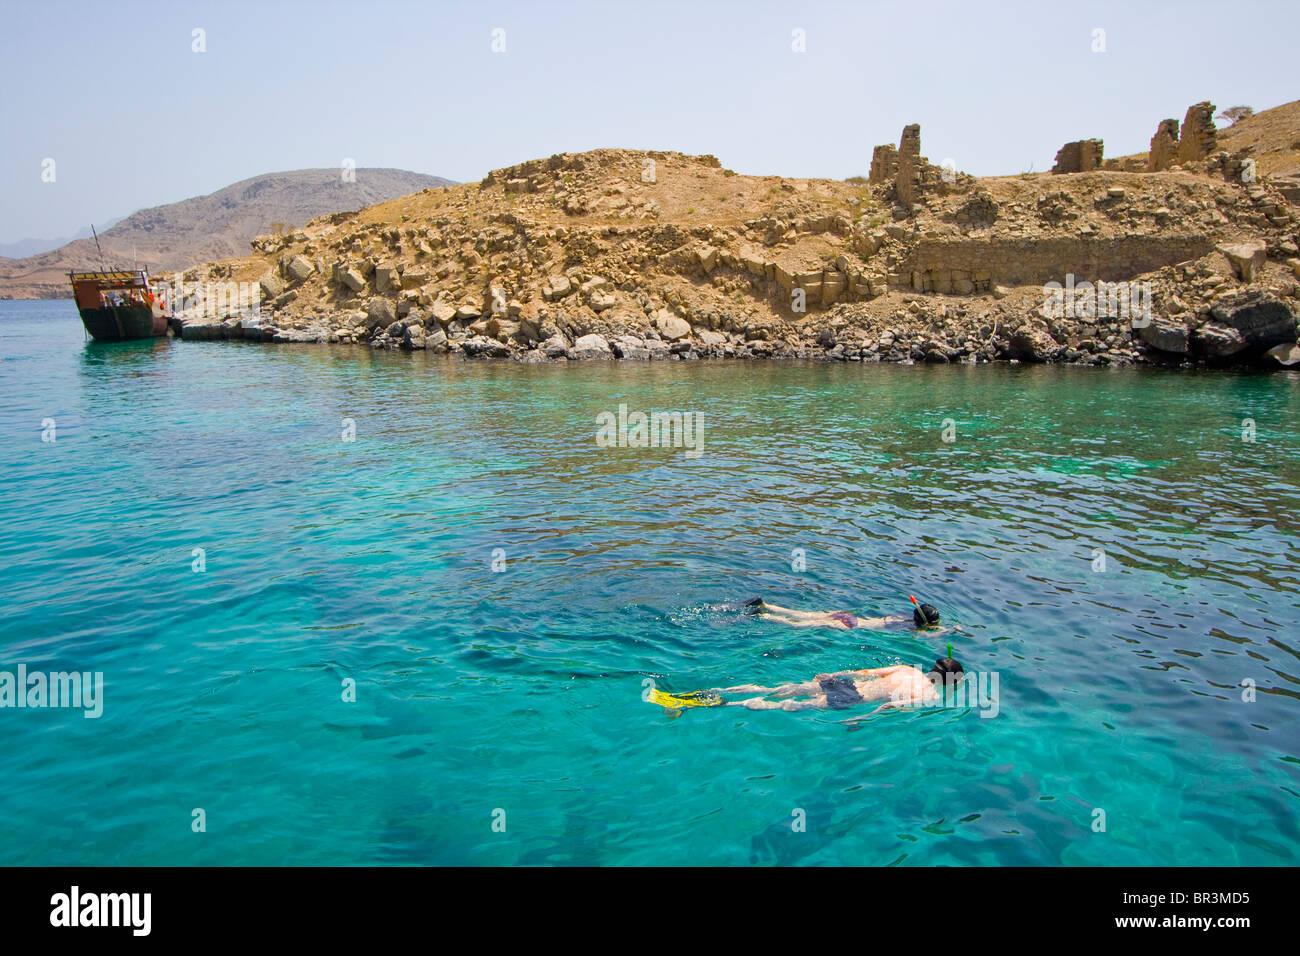 Pareja de turistas Snorkeling en Telegraph isla en la pensinsula Musandam en Omán Imagen De Stock